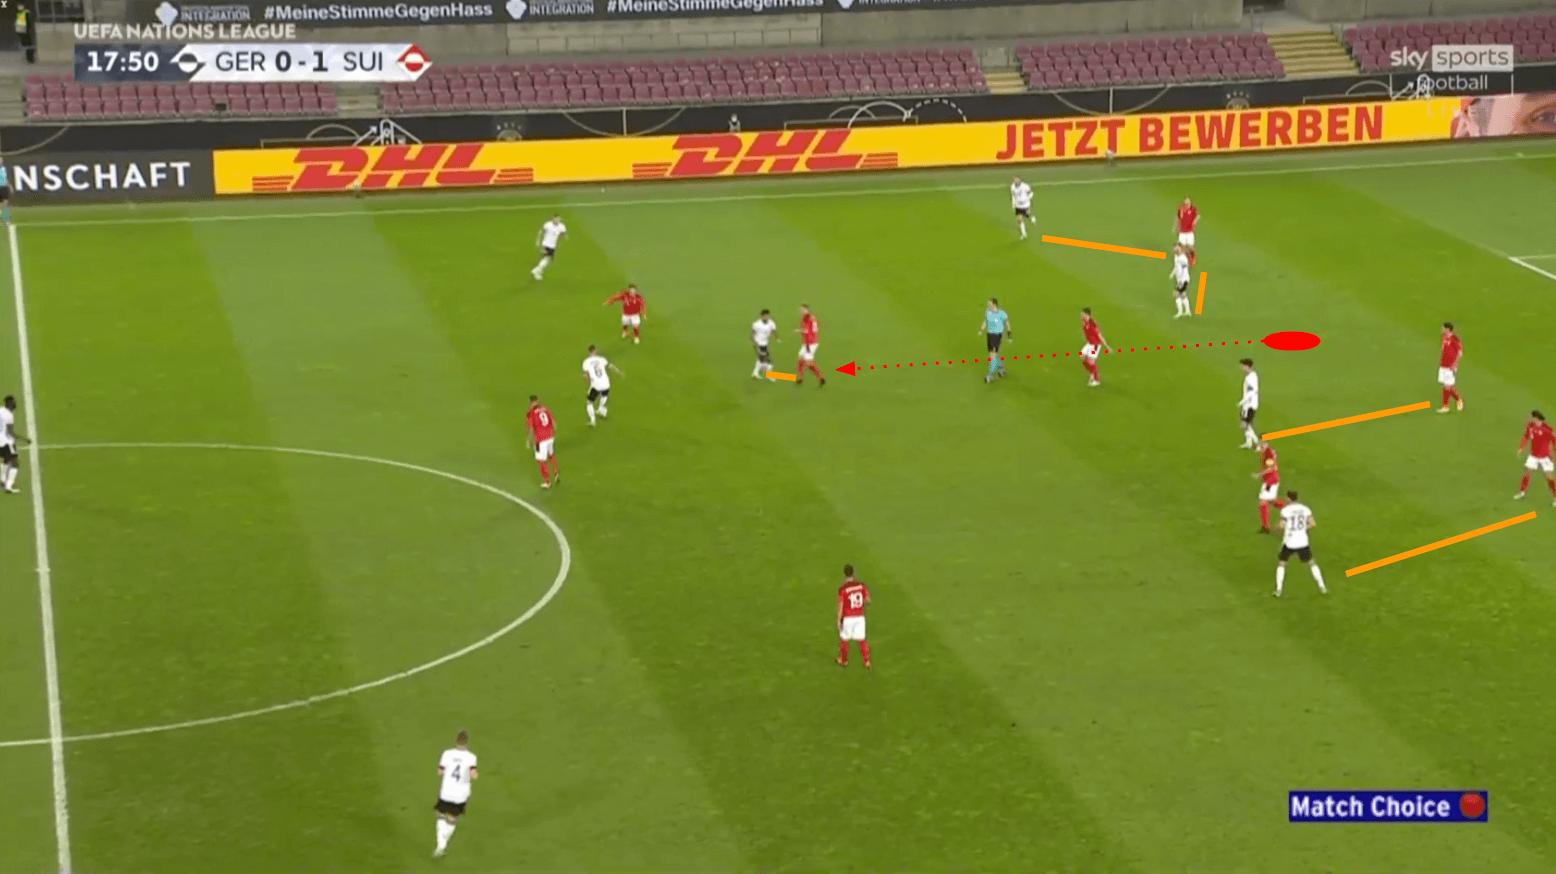 UEFA Nations League 2020/21: Germany vs Switzerland - tactical analysis tactics